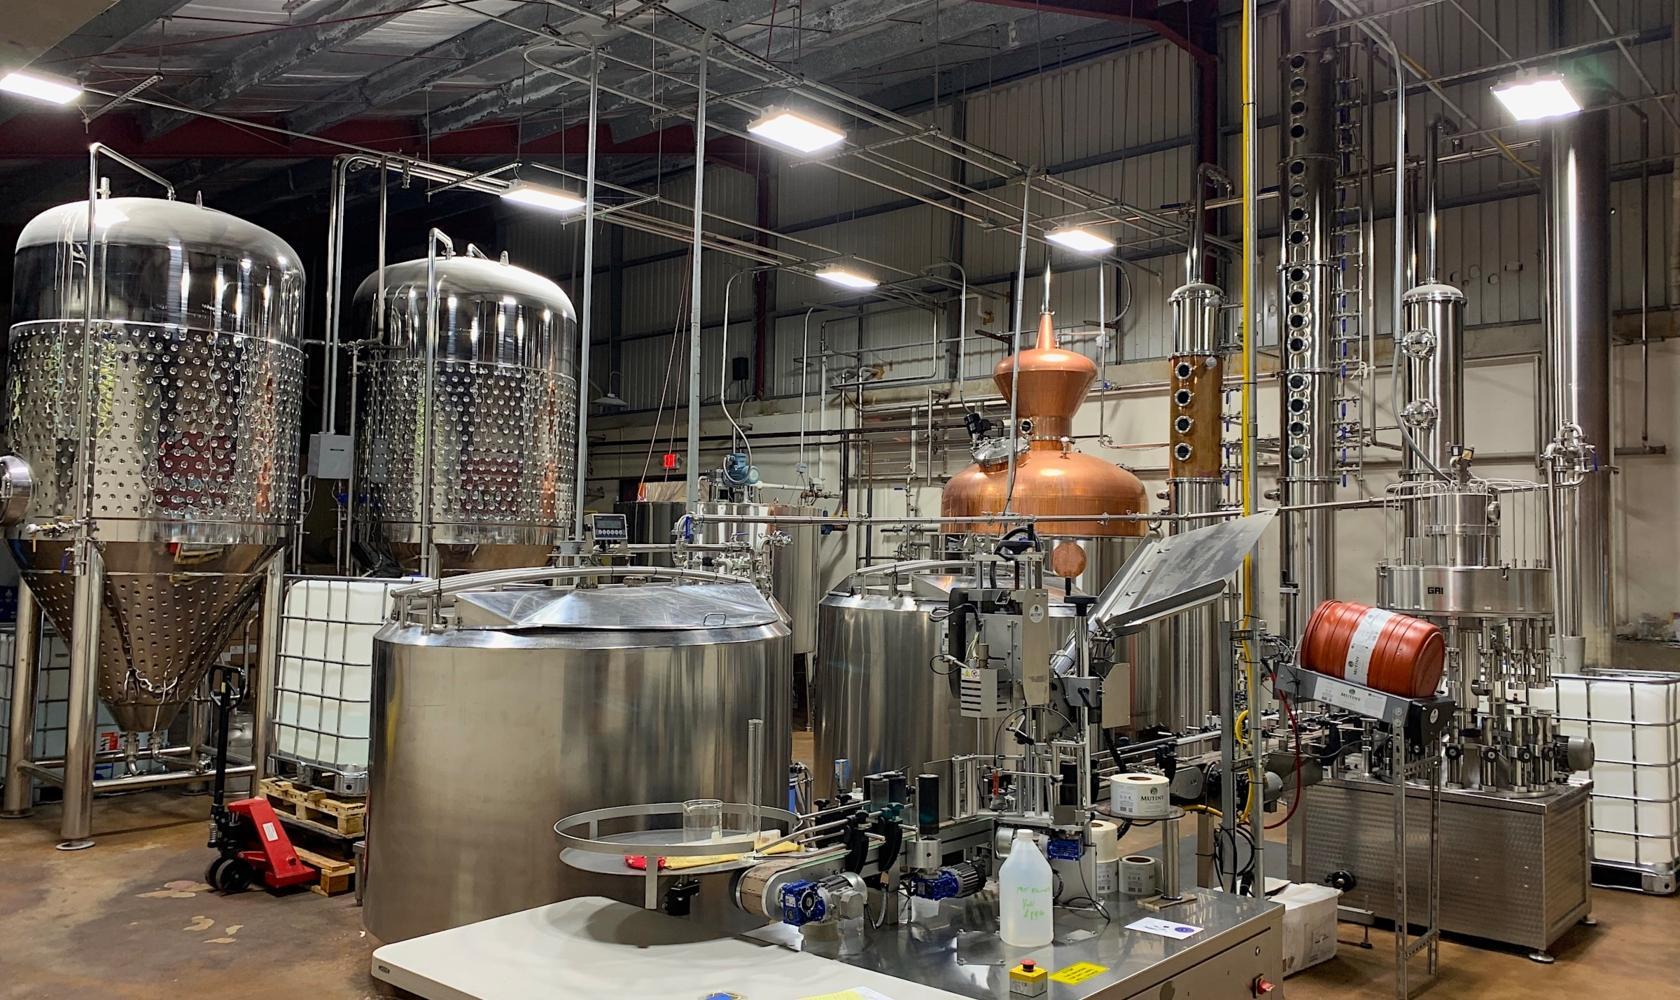 Scion Farm Distillery - amazing still setup